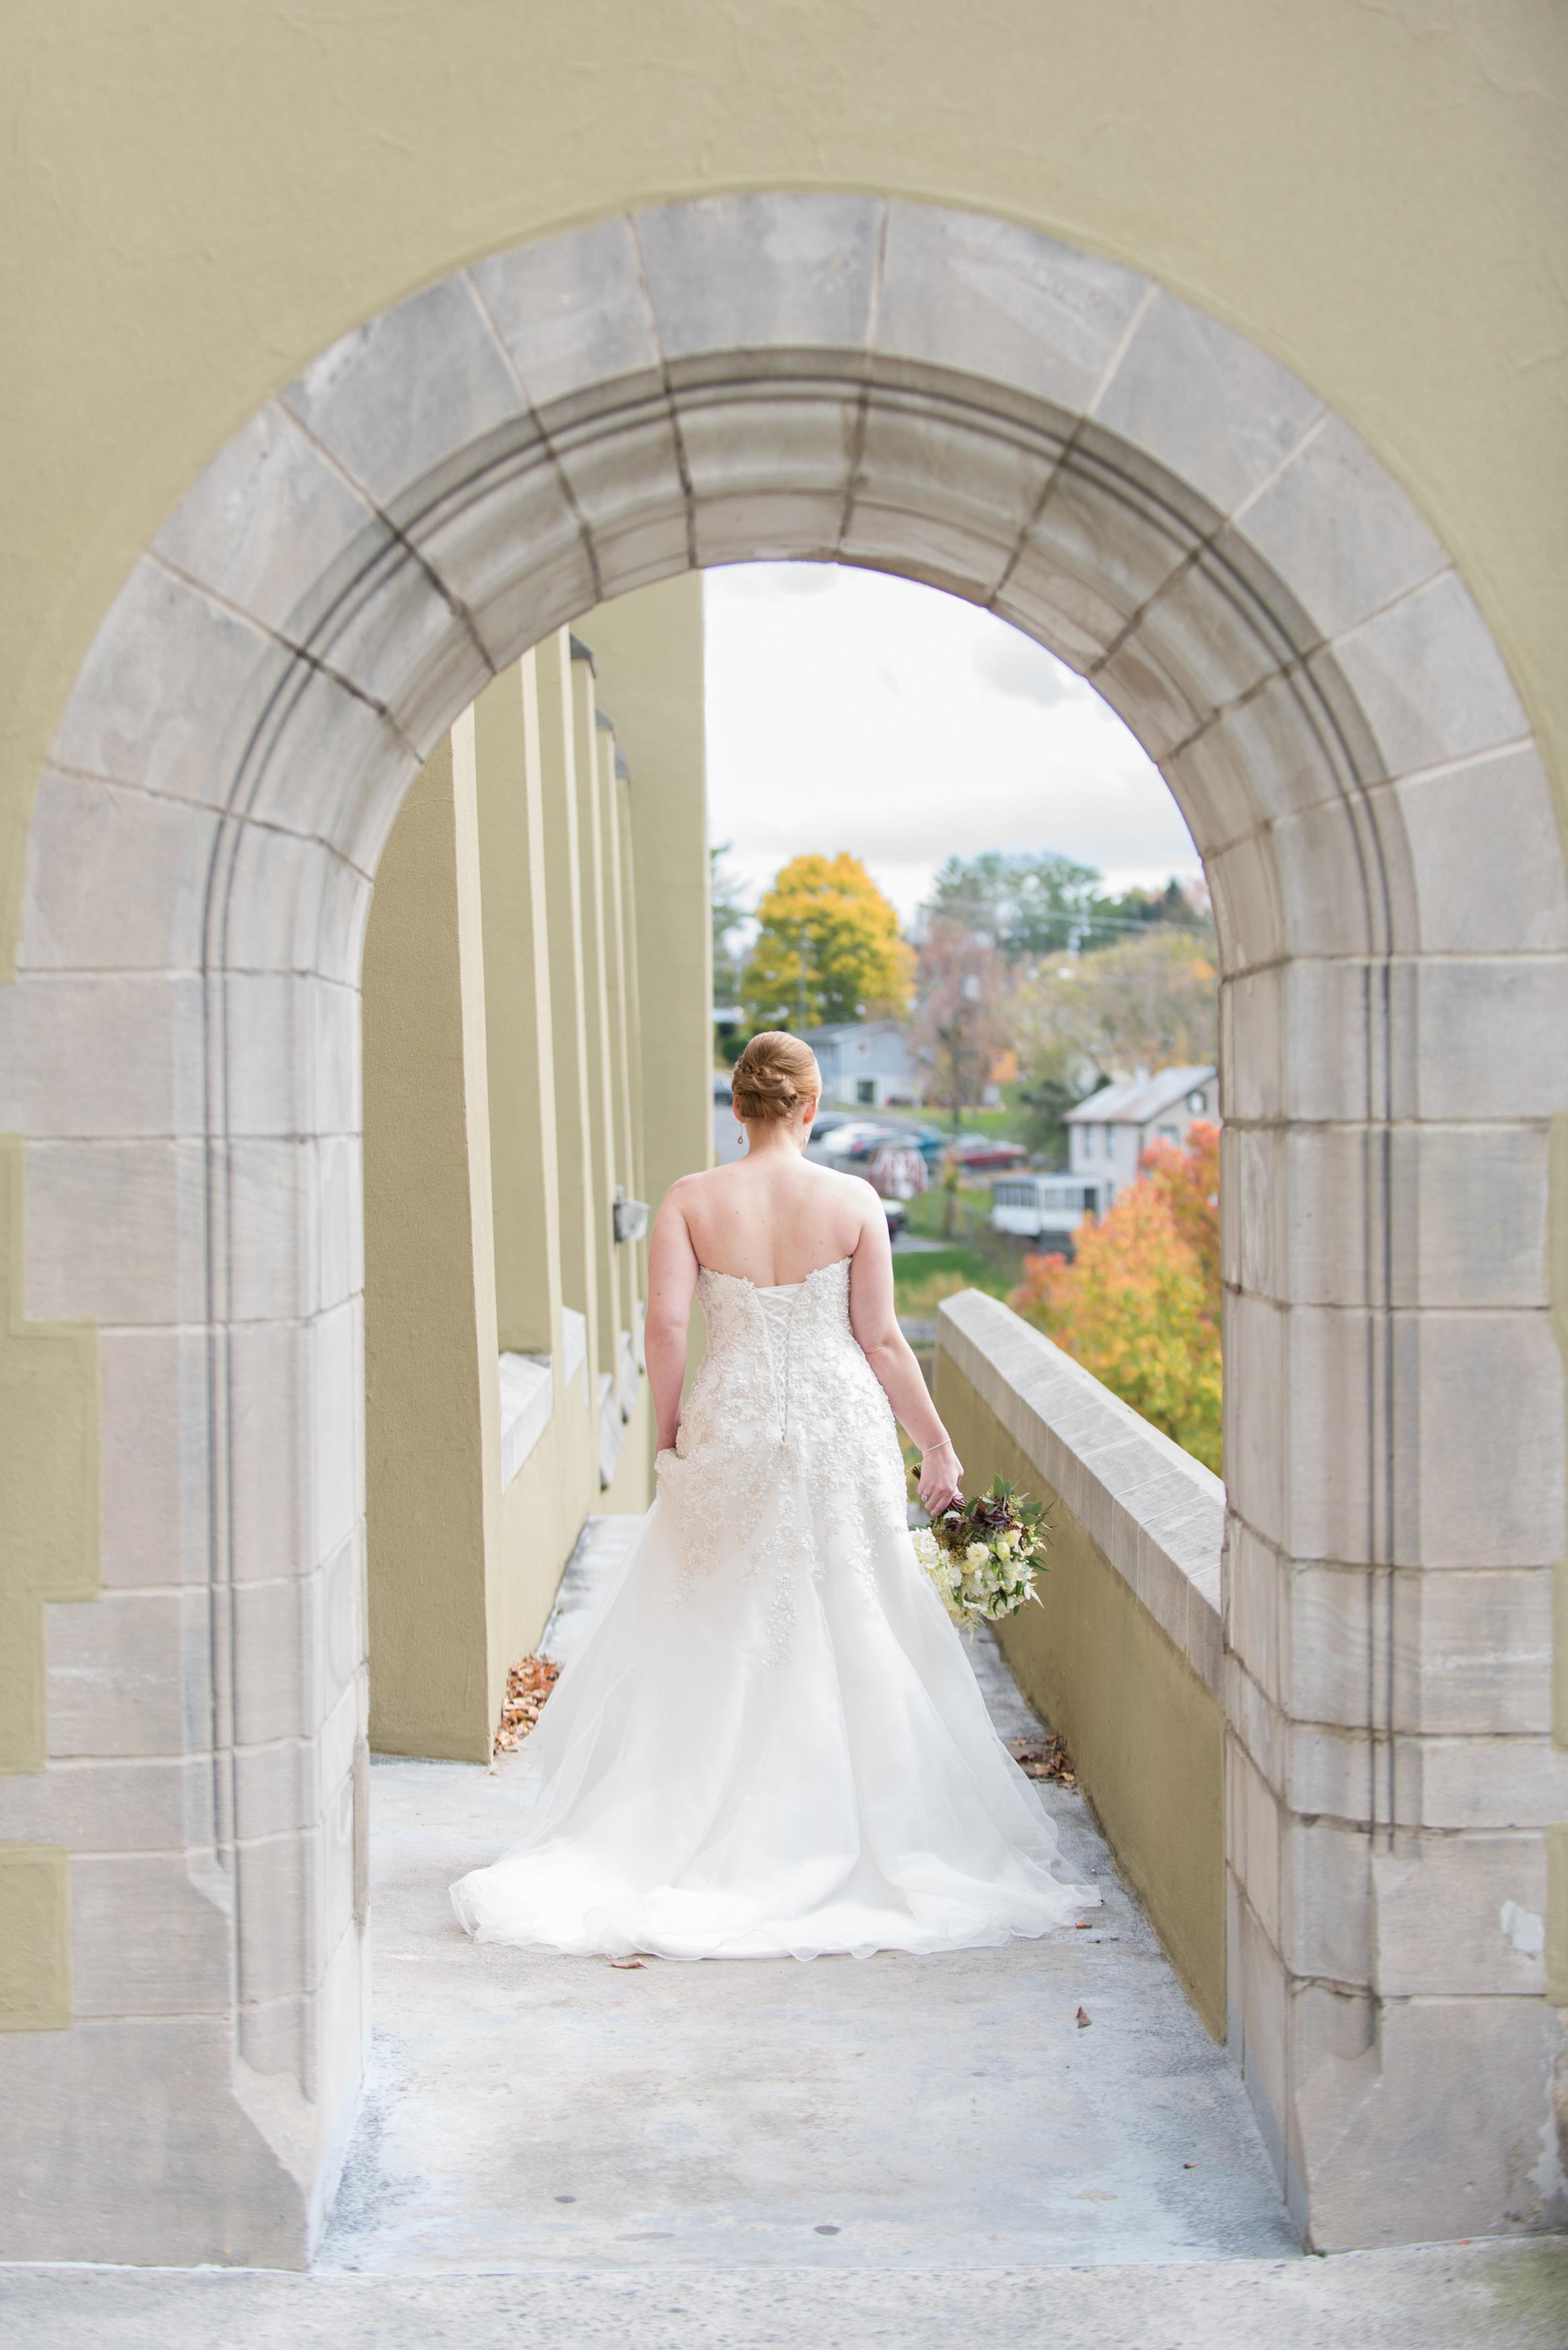 Megan&Hamilton.Bride&GroomPortraits-126.JPG